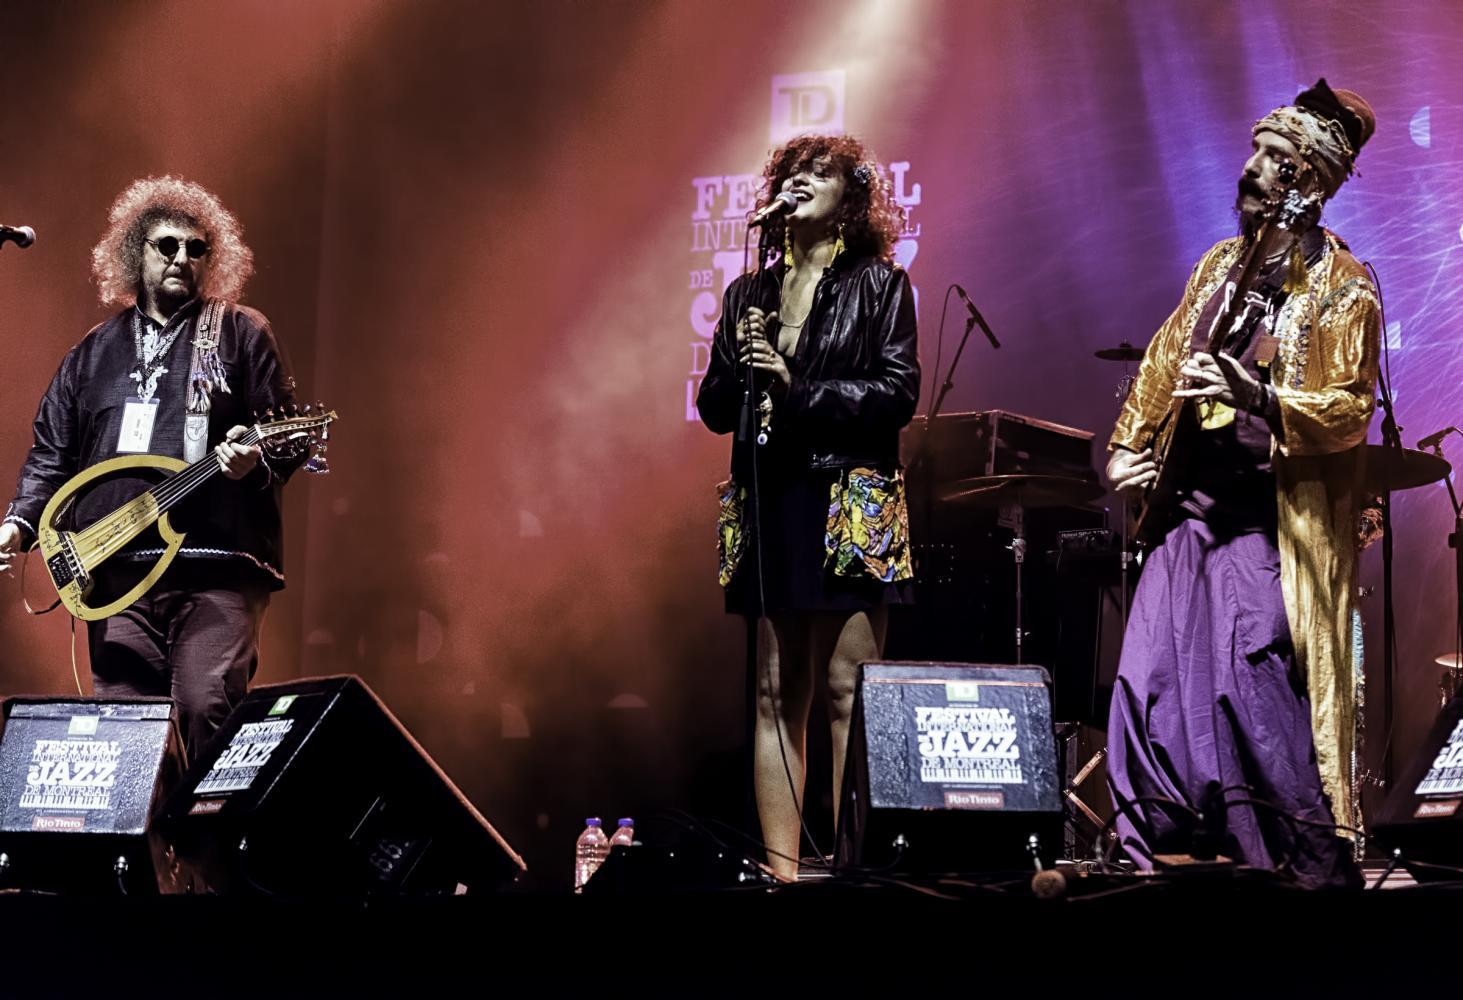 Periklis Tsouklas, Melike Sahin and Murat Ertel with BaBa Zula At The Montreal International Jazz Festival 2016